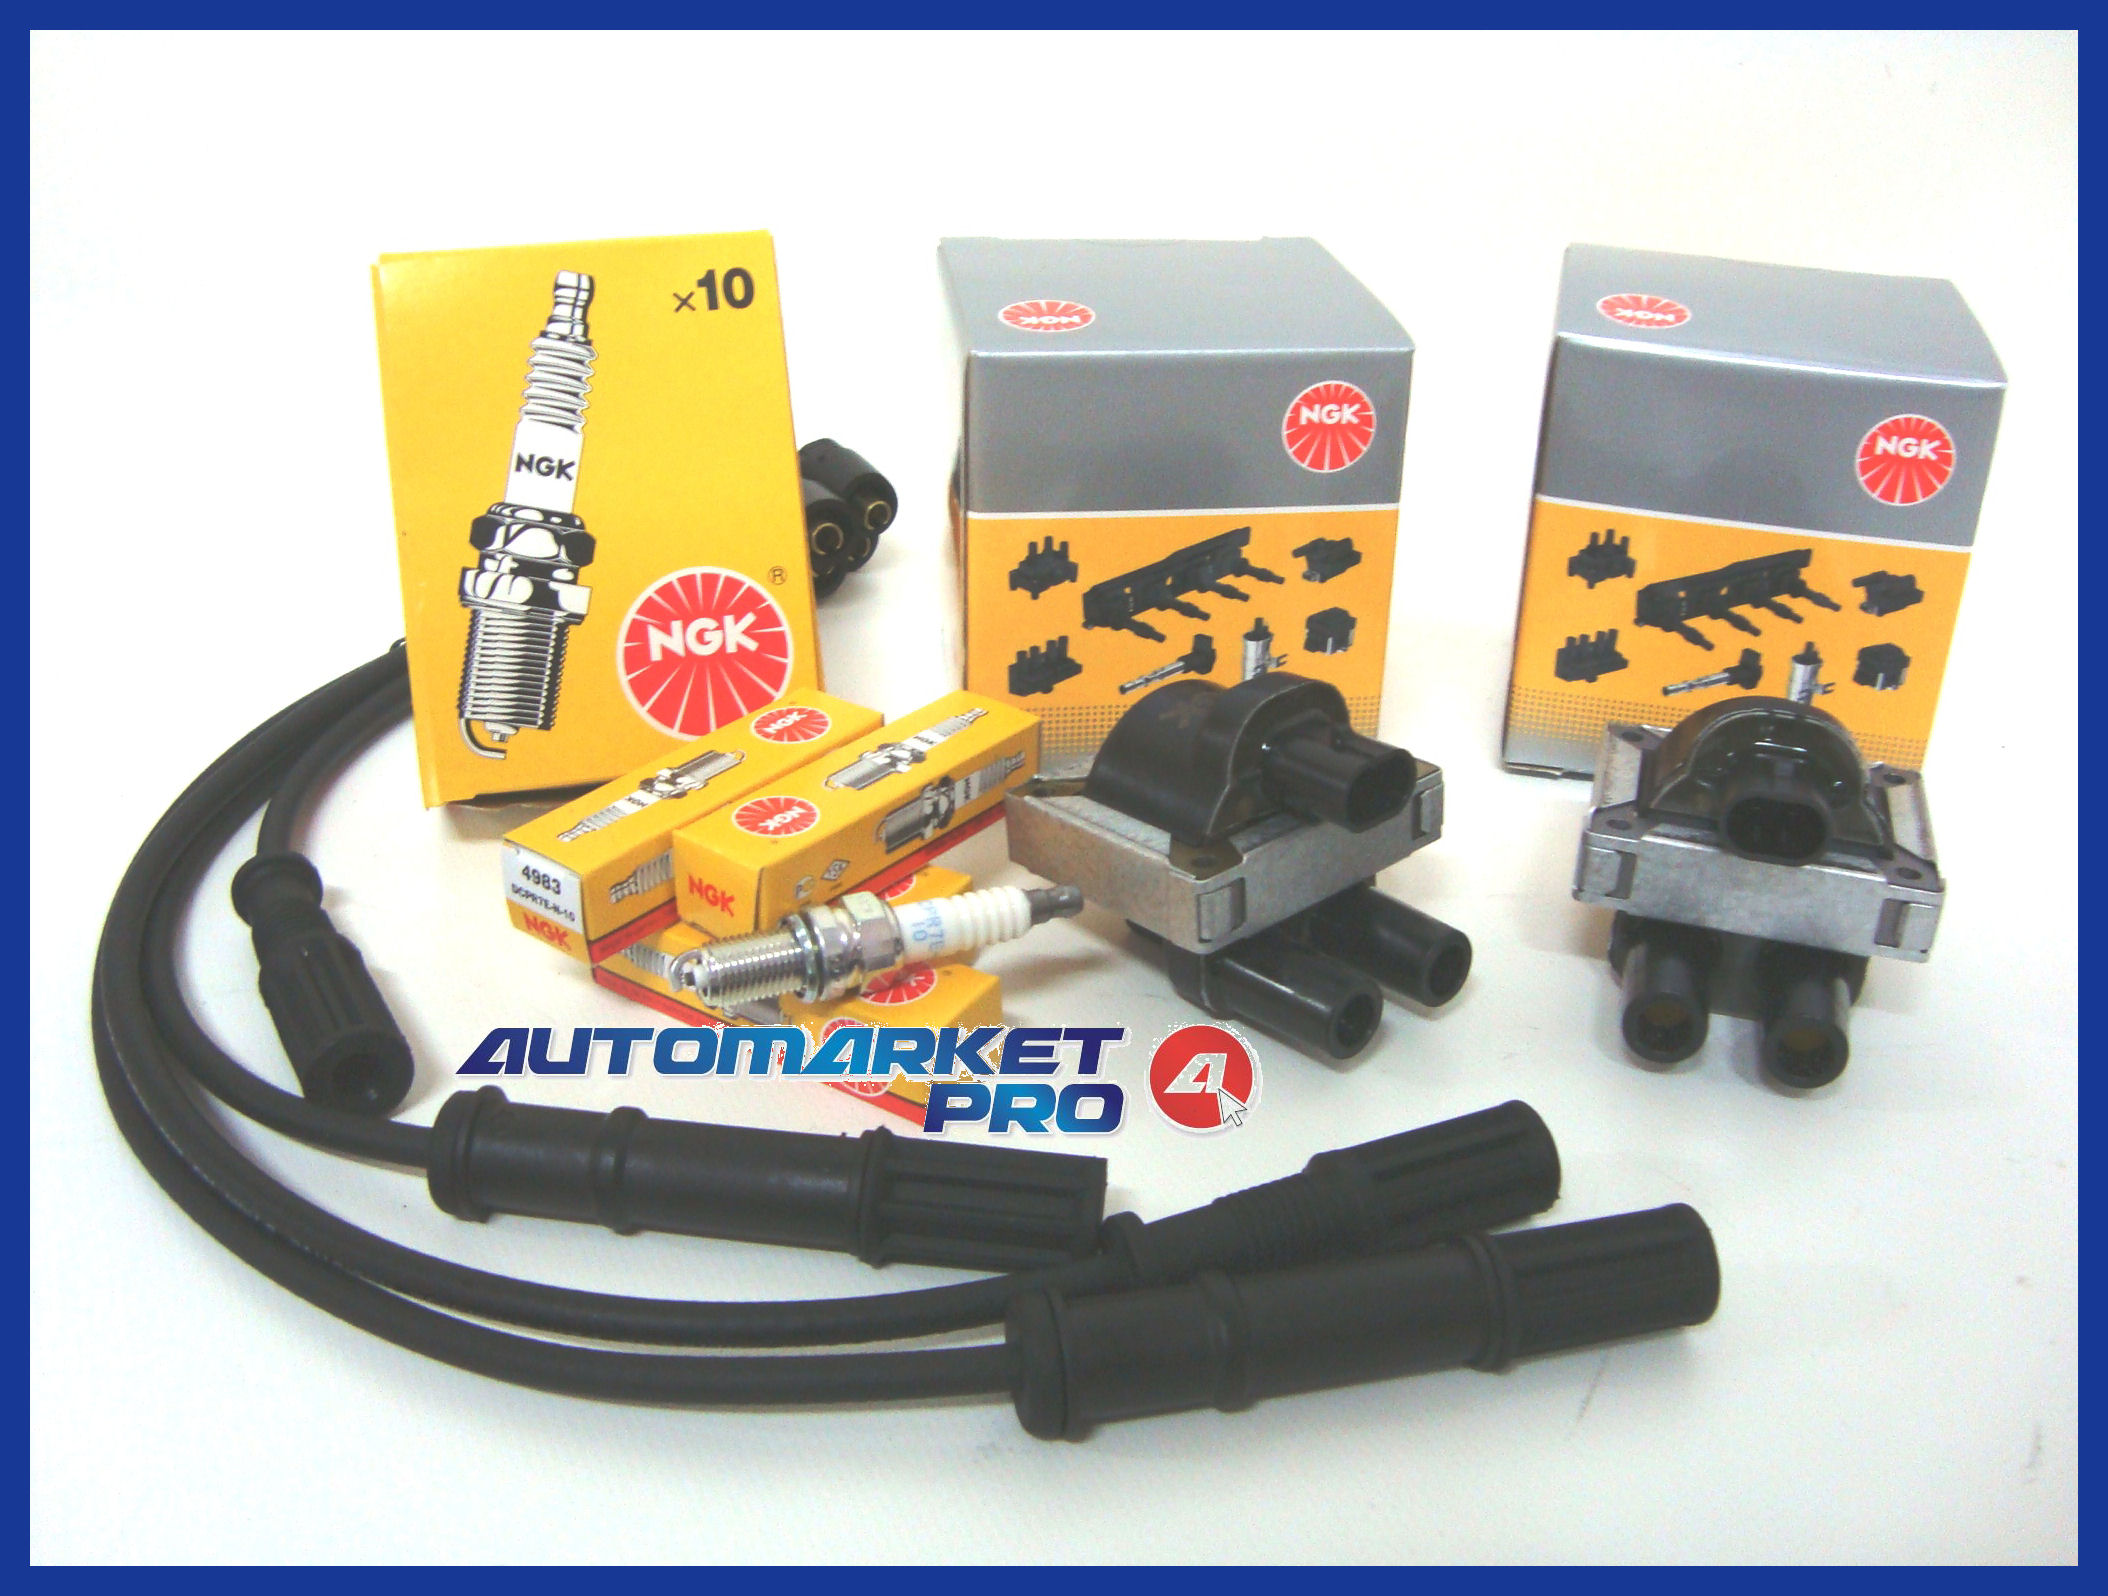 Schema Elettrico Fiat Punto 1 2 8v : Kit accensione bobine candele cavi fiat punto v